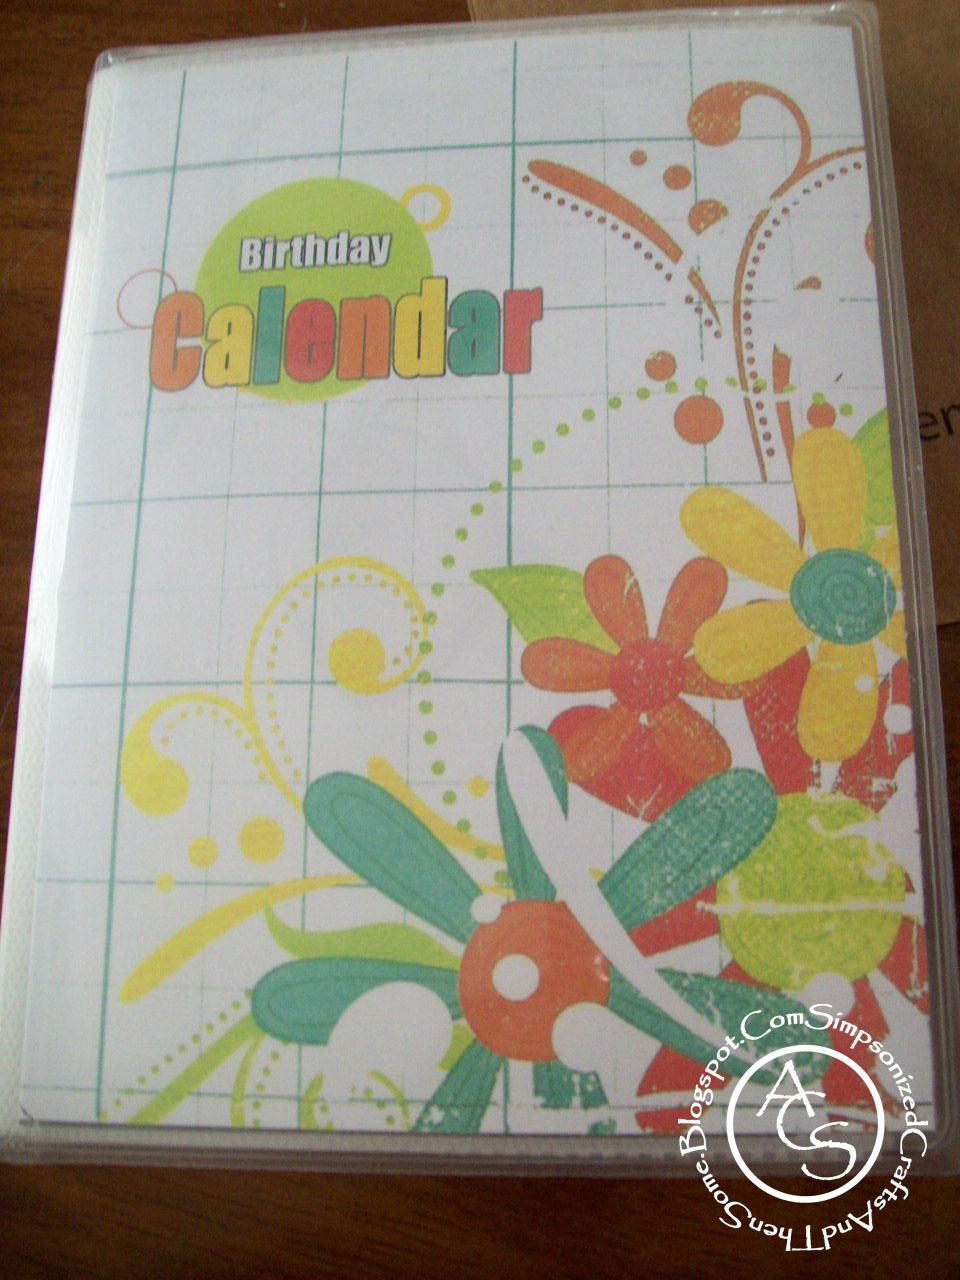 Calendar Book Printable : Simpsonized crafts free printable birthday calendar using